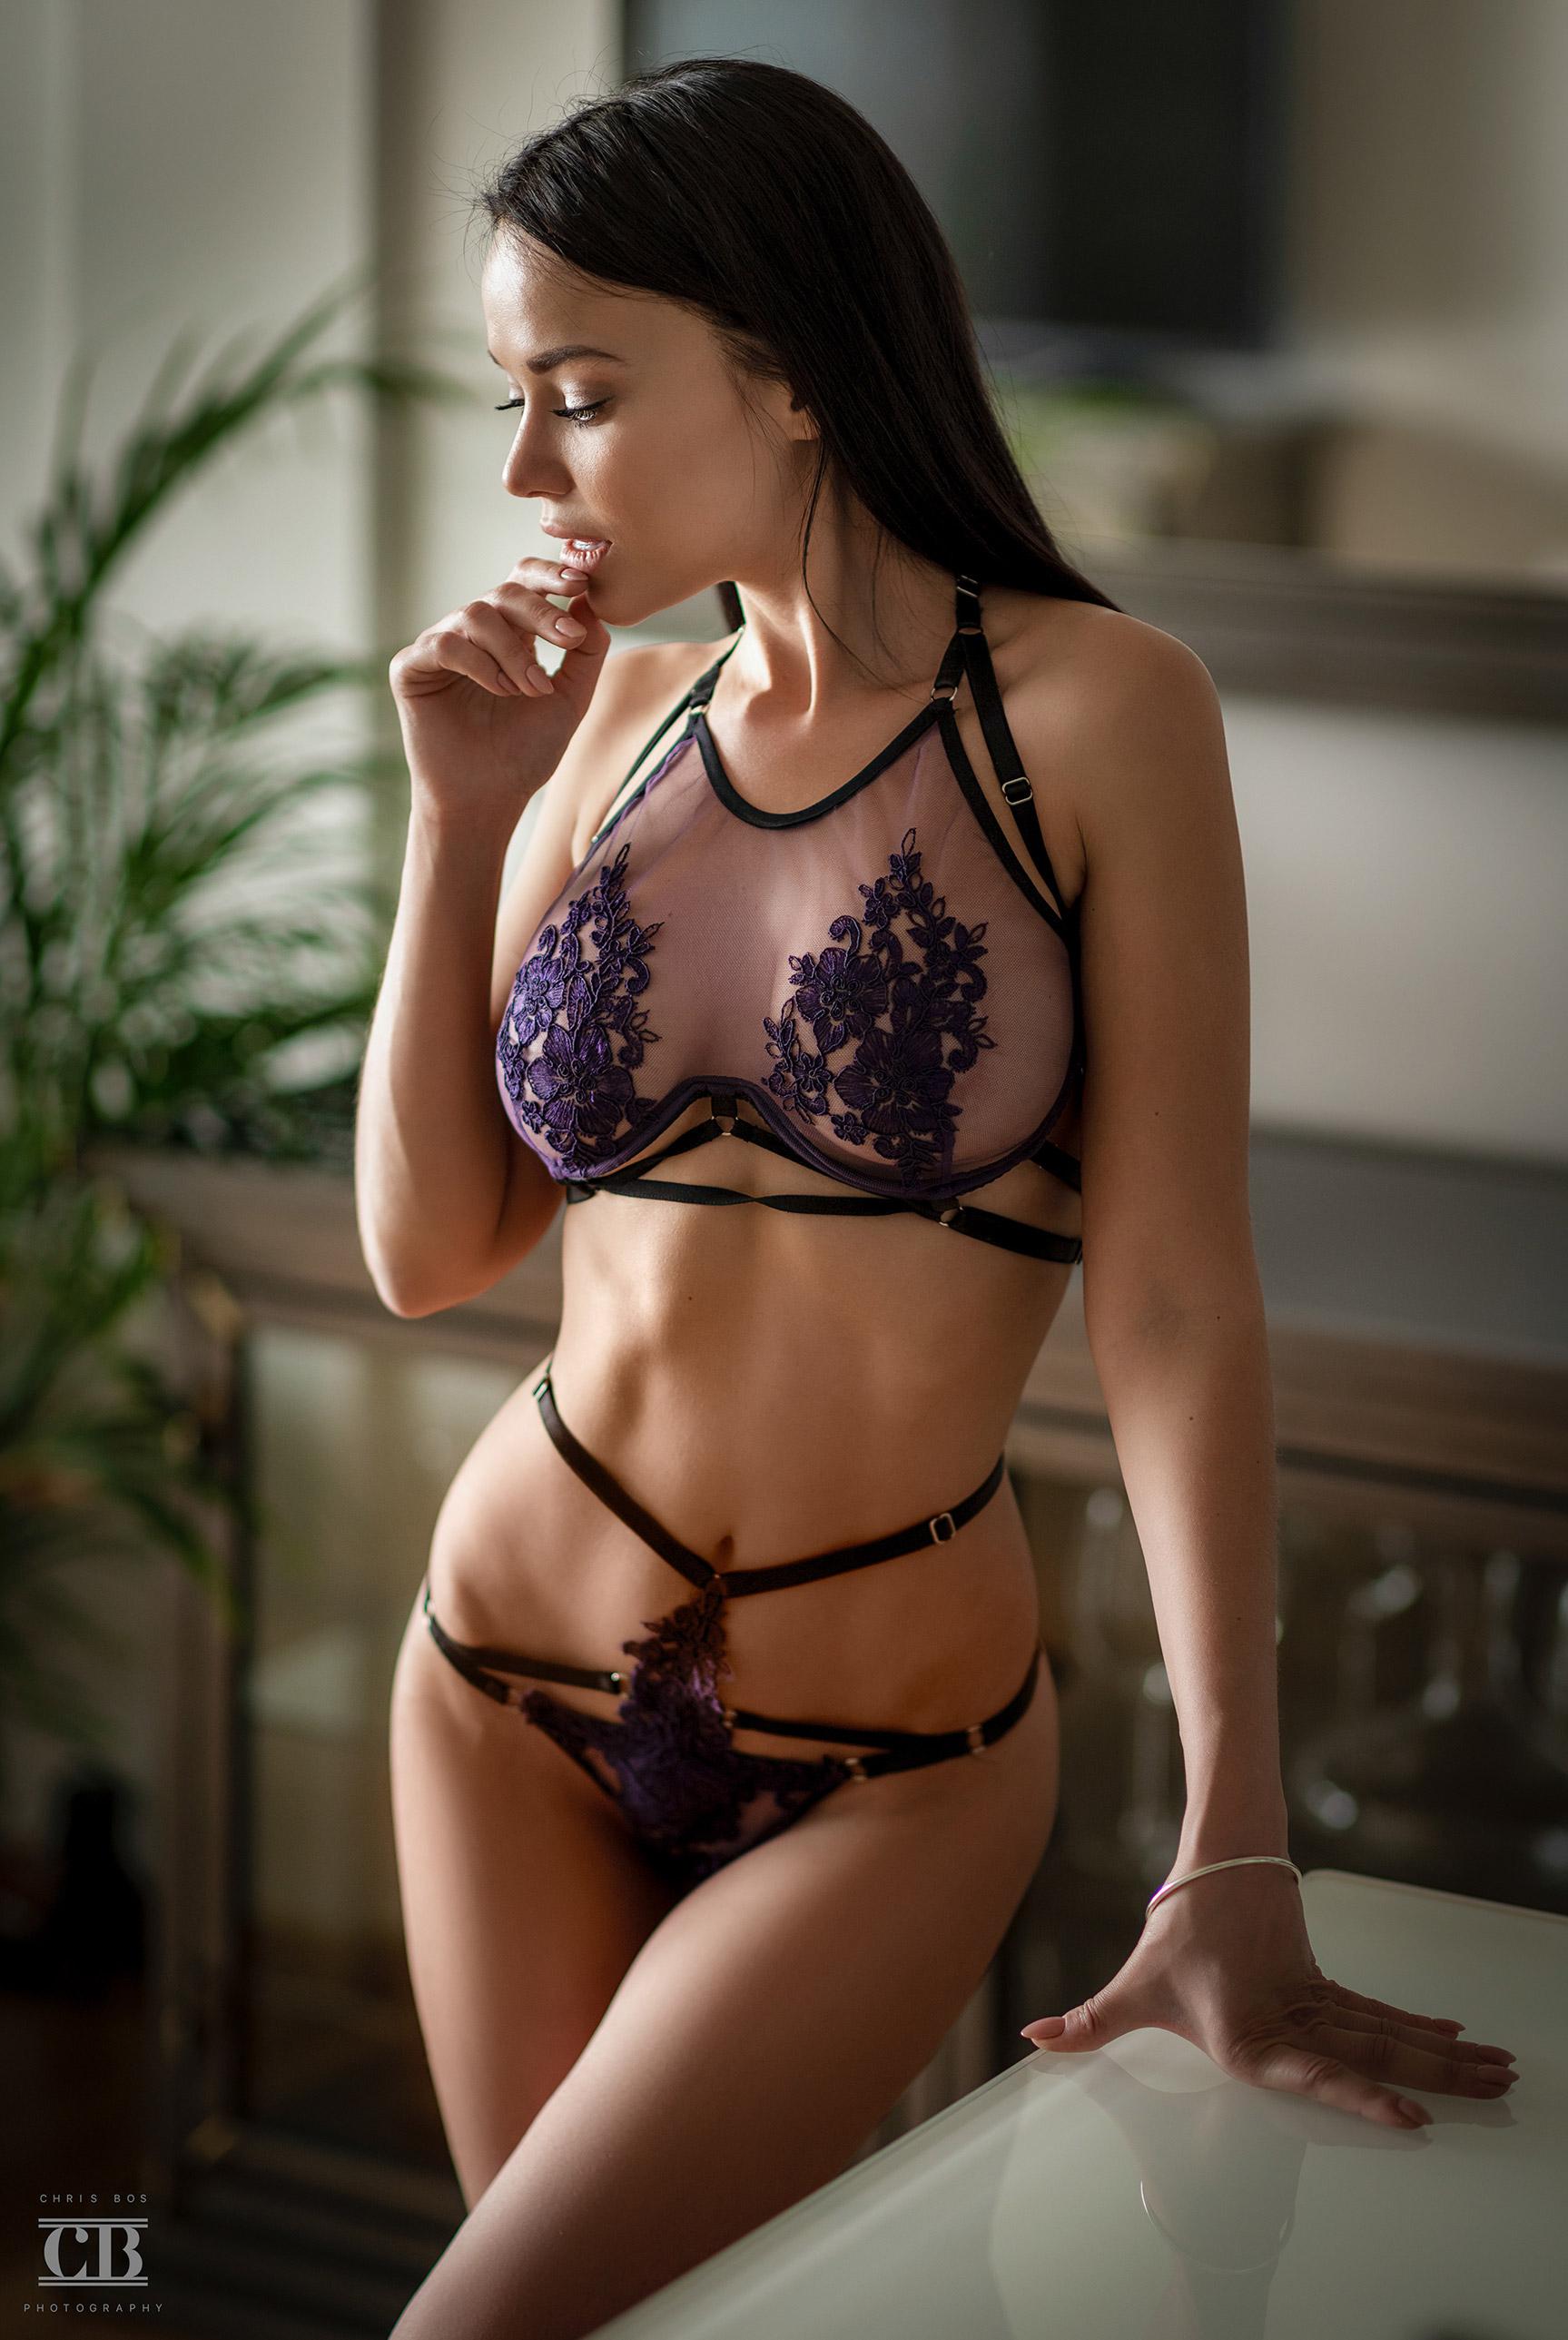 украинская модель Ангелина Петрова / Angelina Petrova by Chris Bos